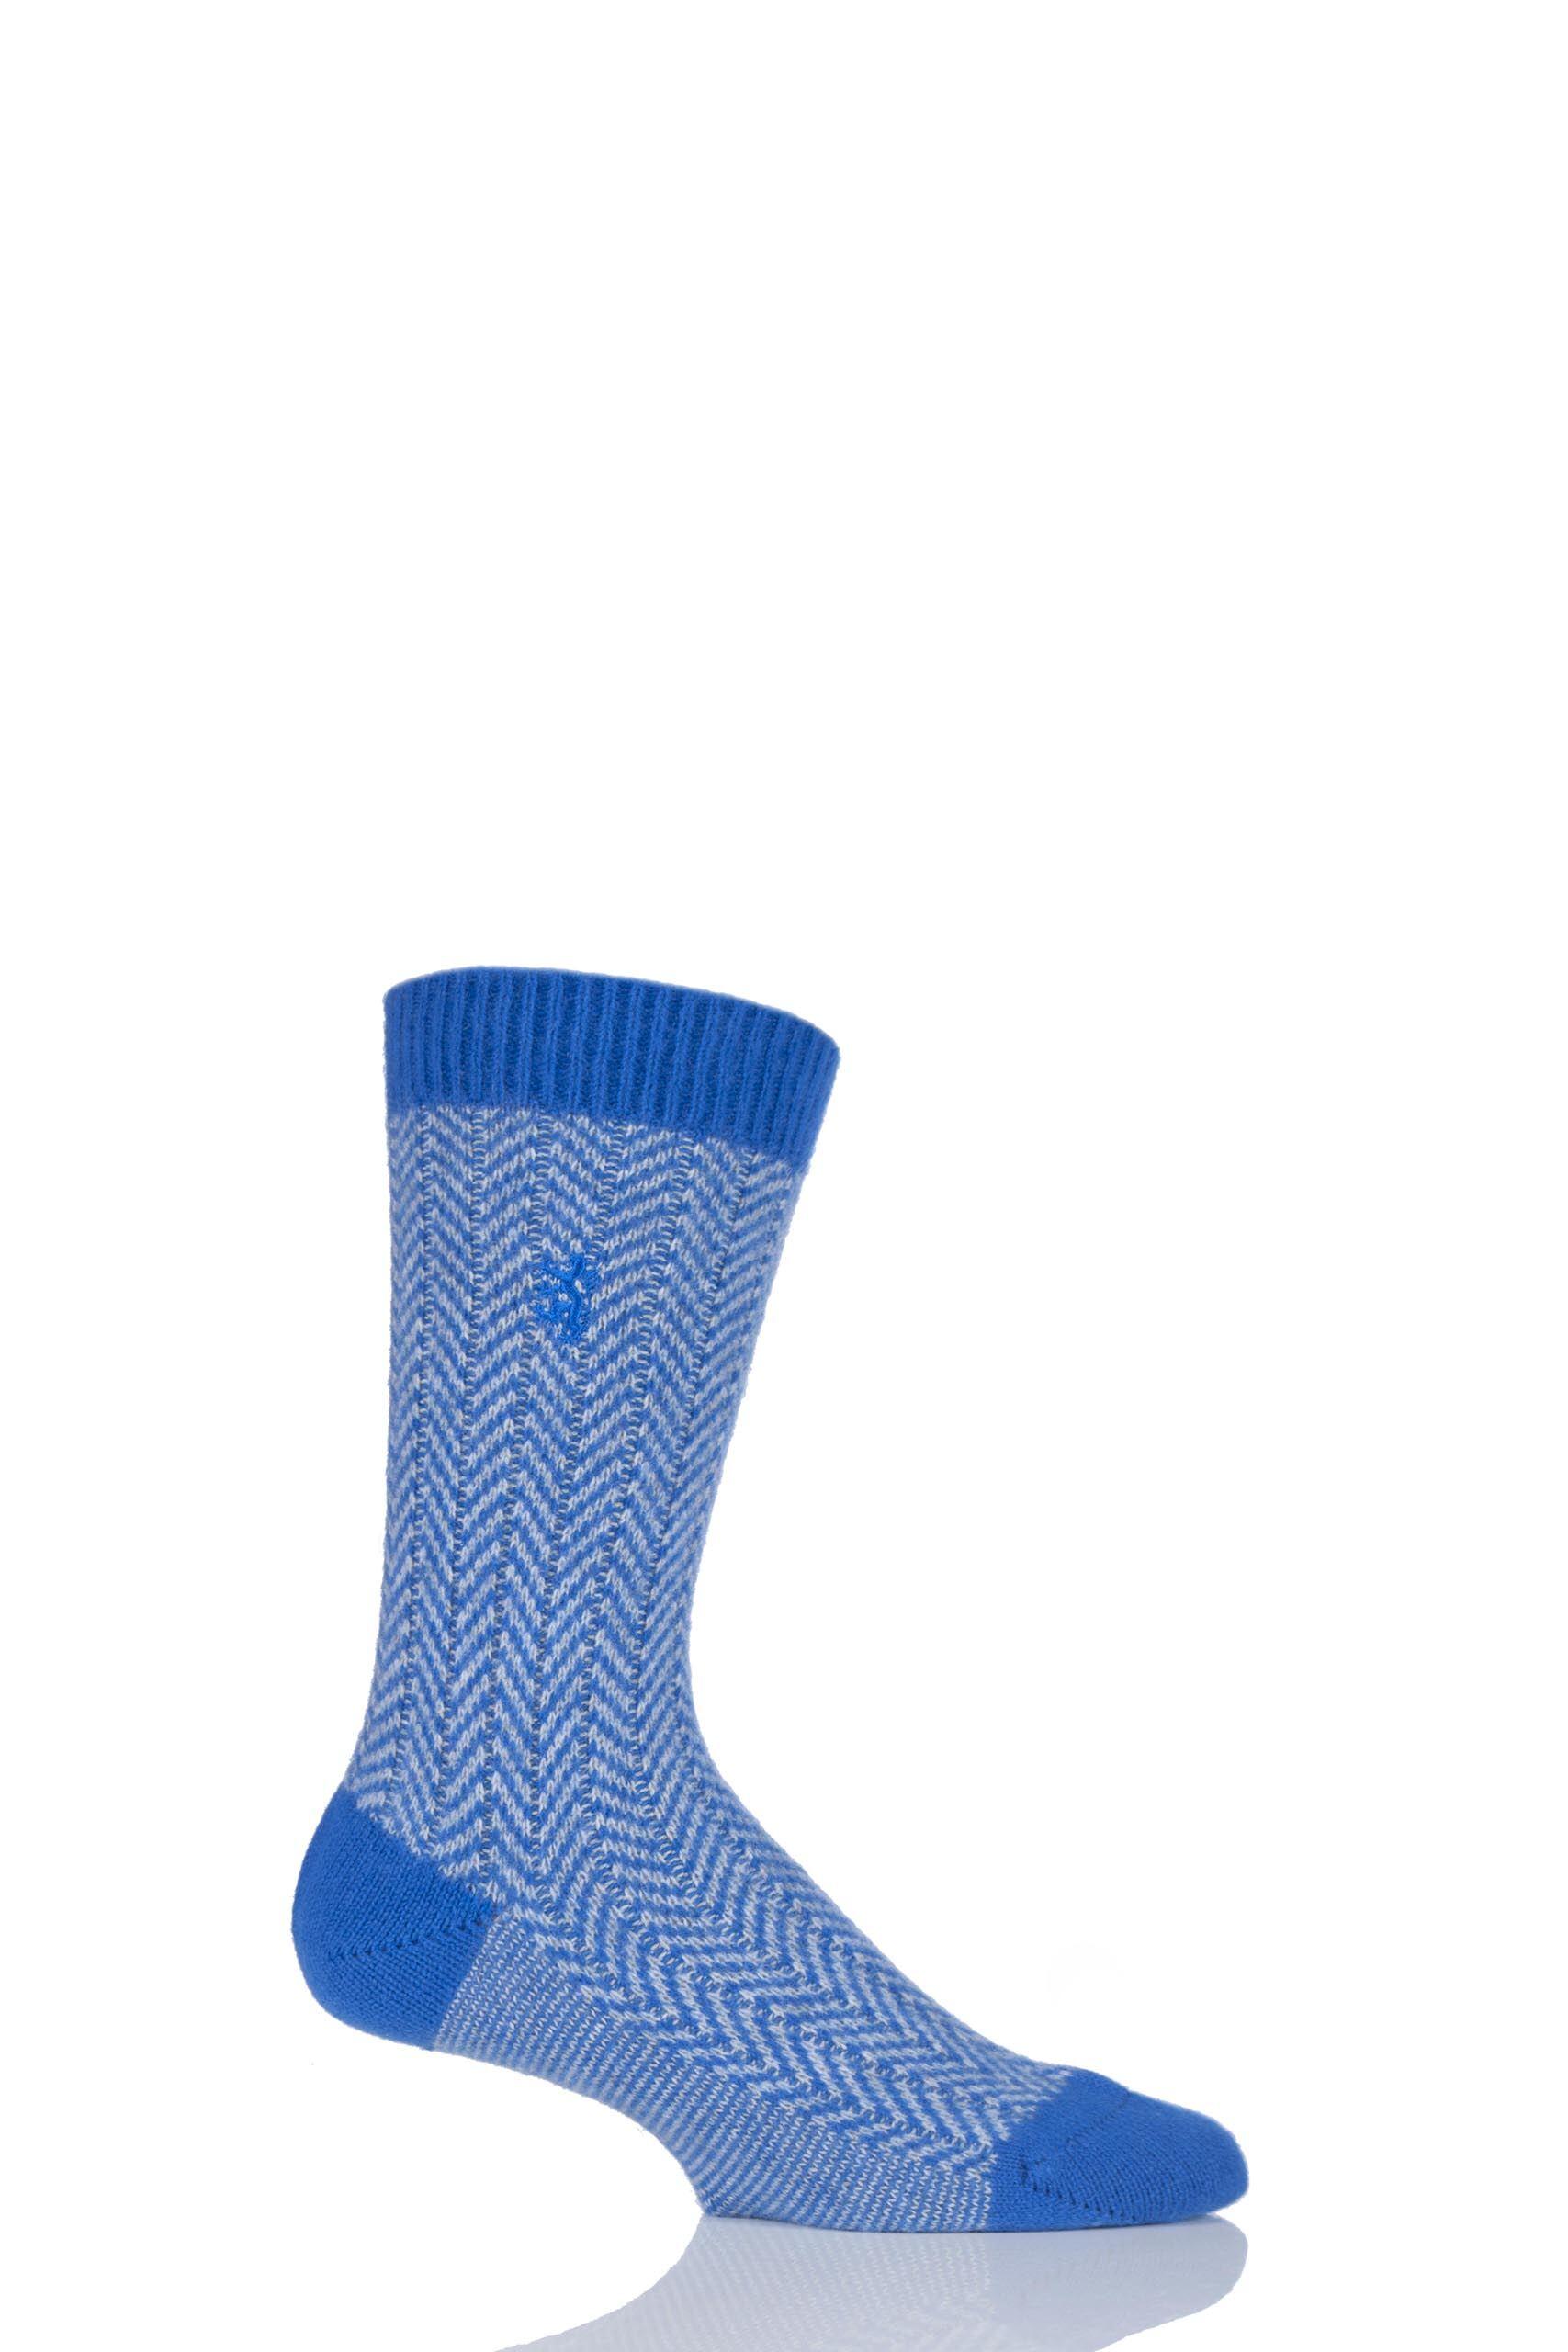 Image of 1 Pair Bright Blue 85% Cashmere Herringbone Socks Men's 6-8.5 Mens - Pringle of Scotland